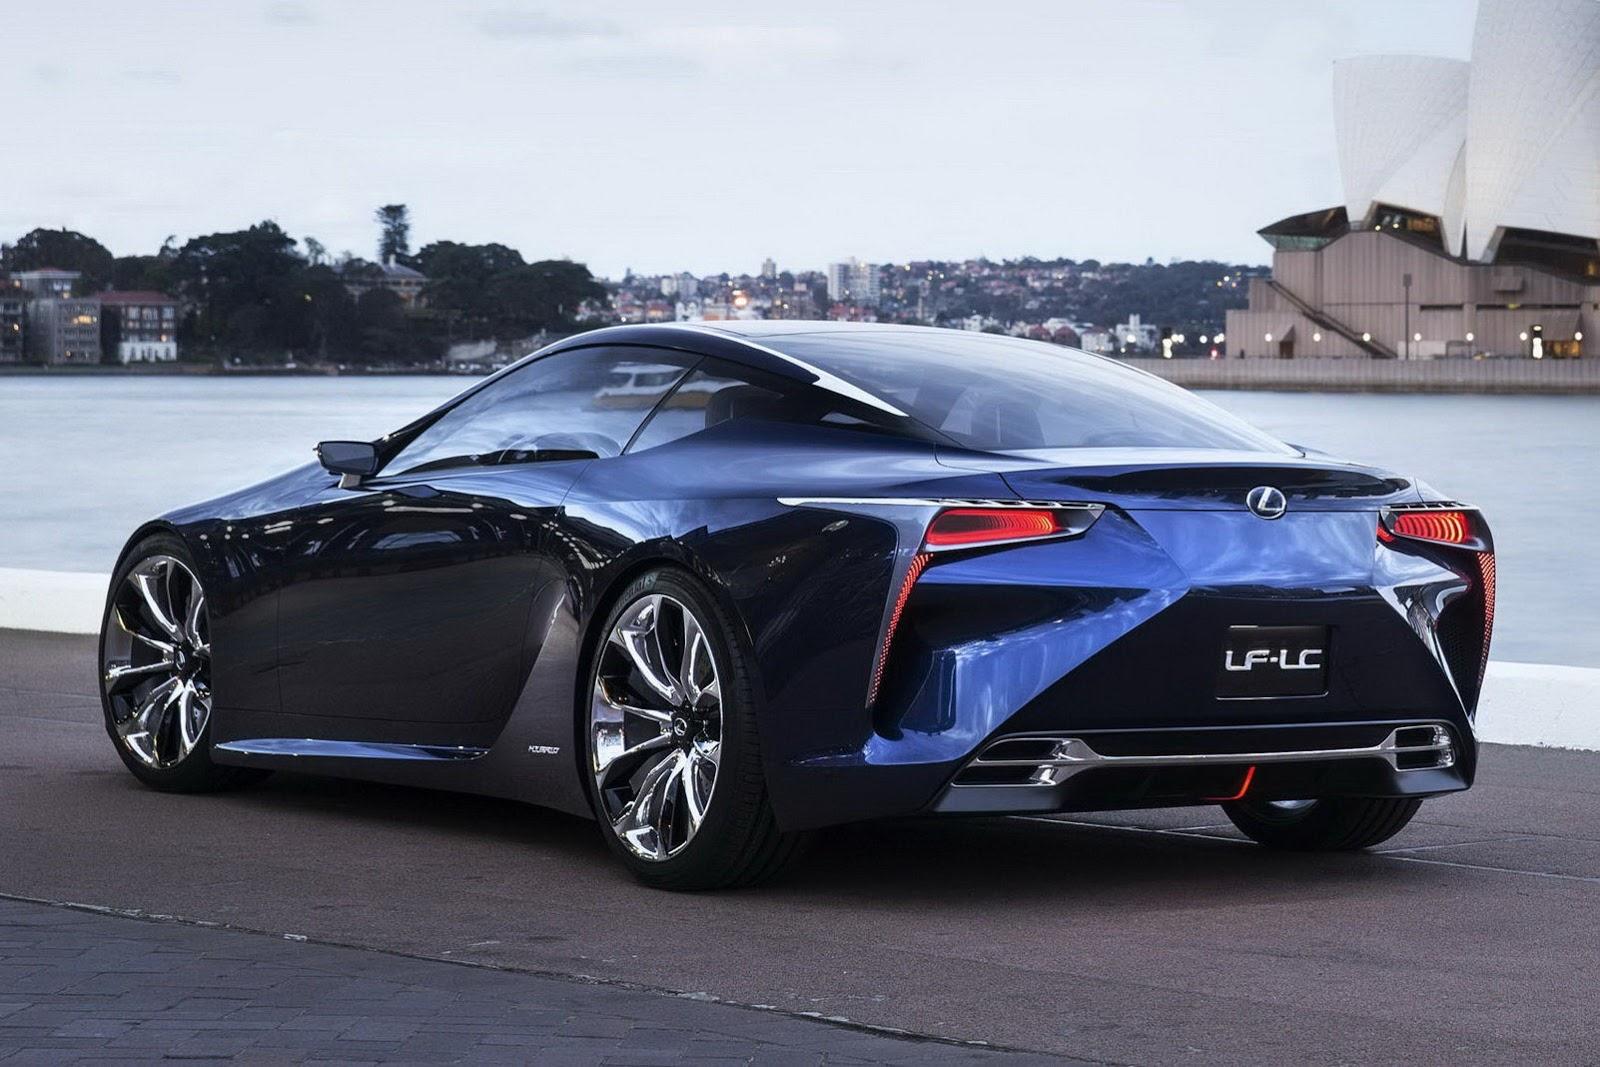 https://s1.cdn.autoevolution.com/images/news/gallery/lexus-unveils-blue-lf-lc-concept-for-sydney-auto-show-photo-gallery_15.jpg